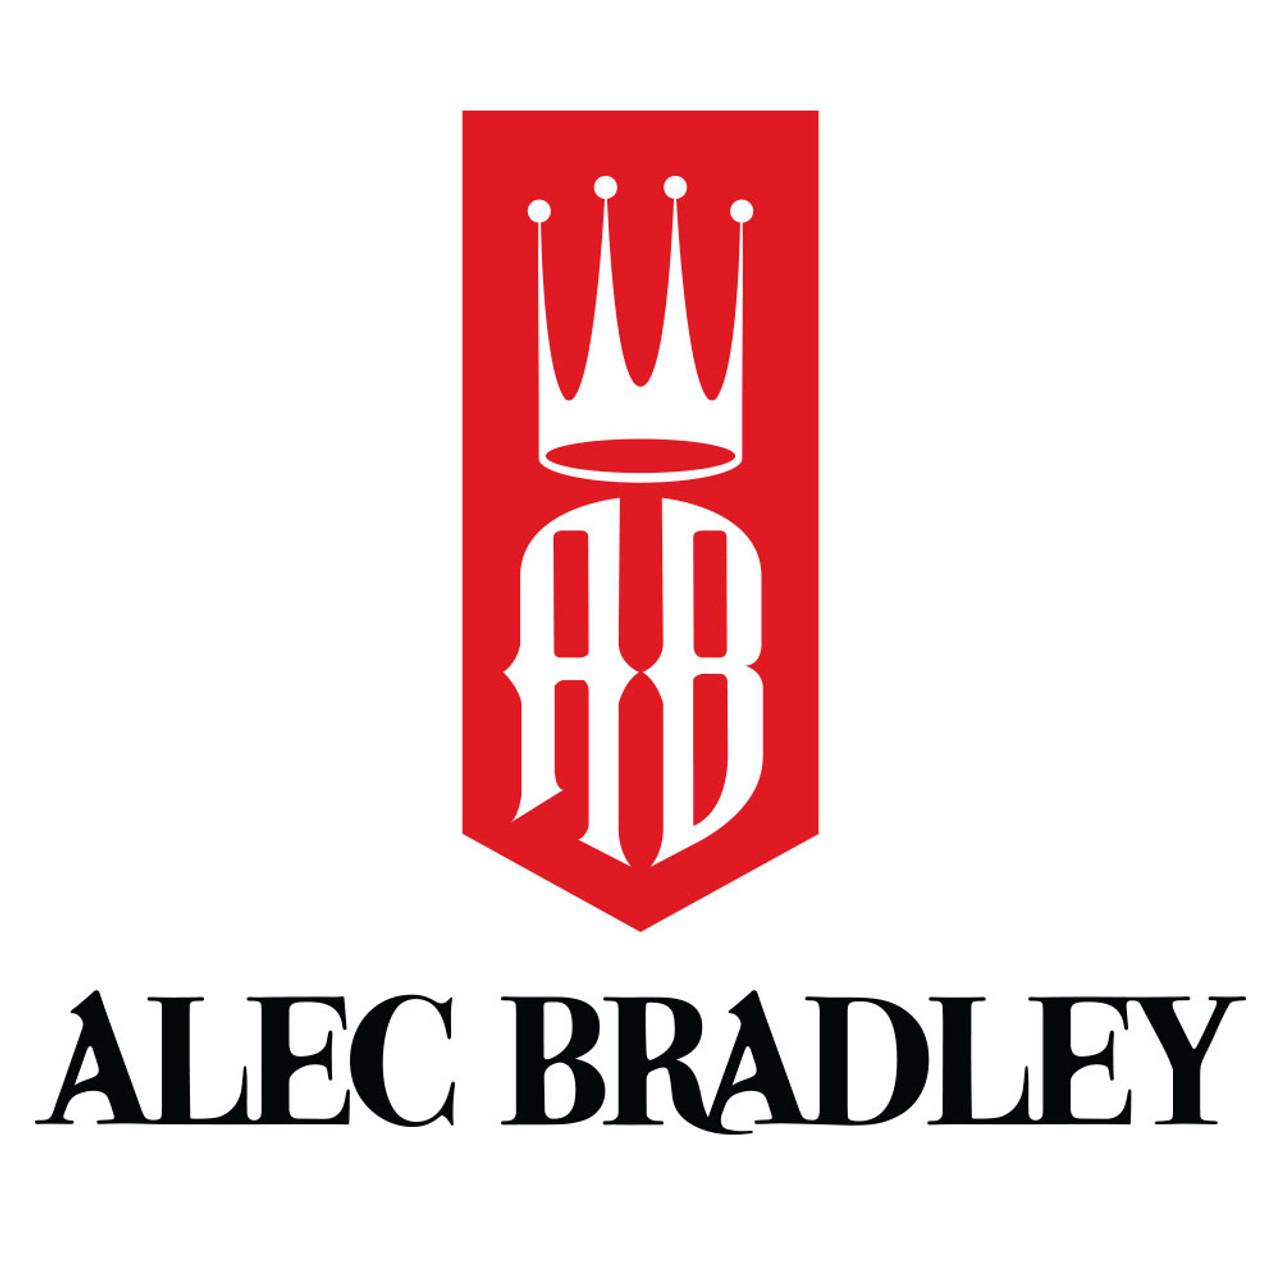 Alec Bradley Magic Toast Robusto Cigars - 5 x 52 (Box of 20)